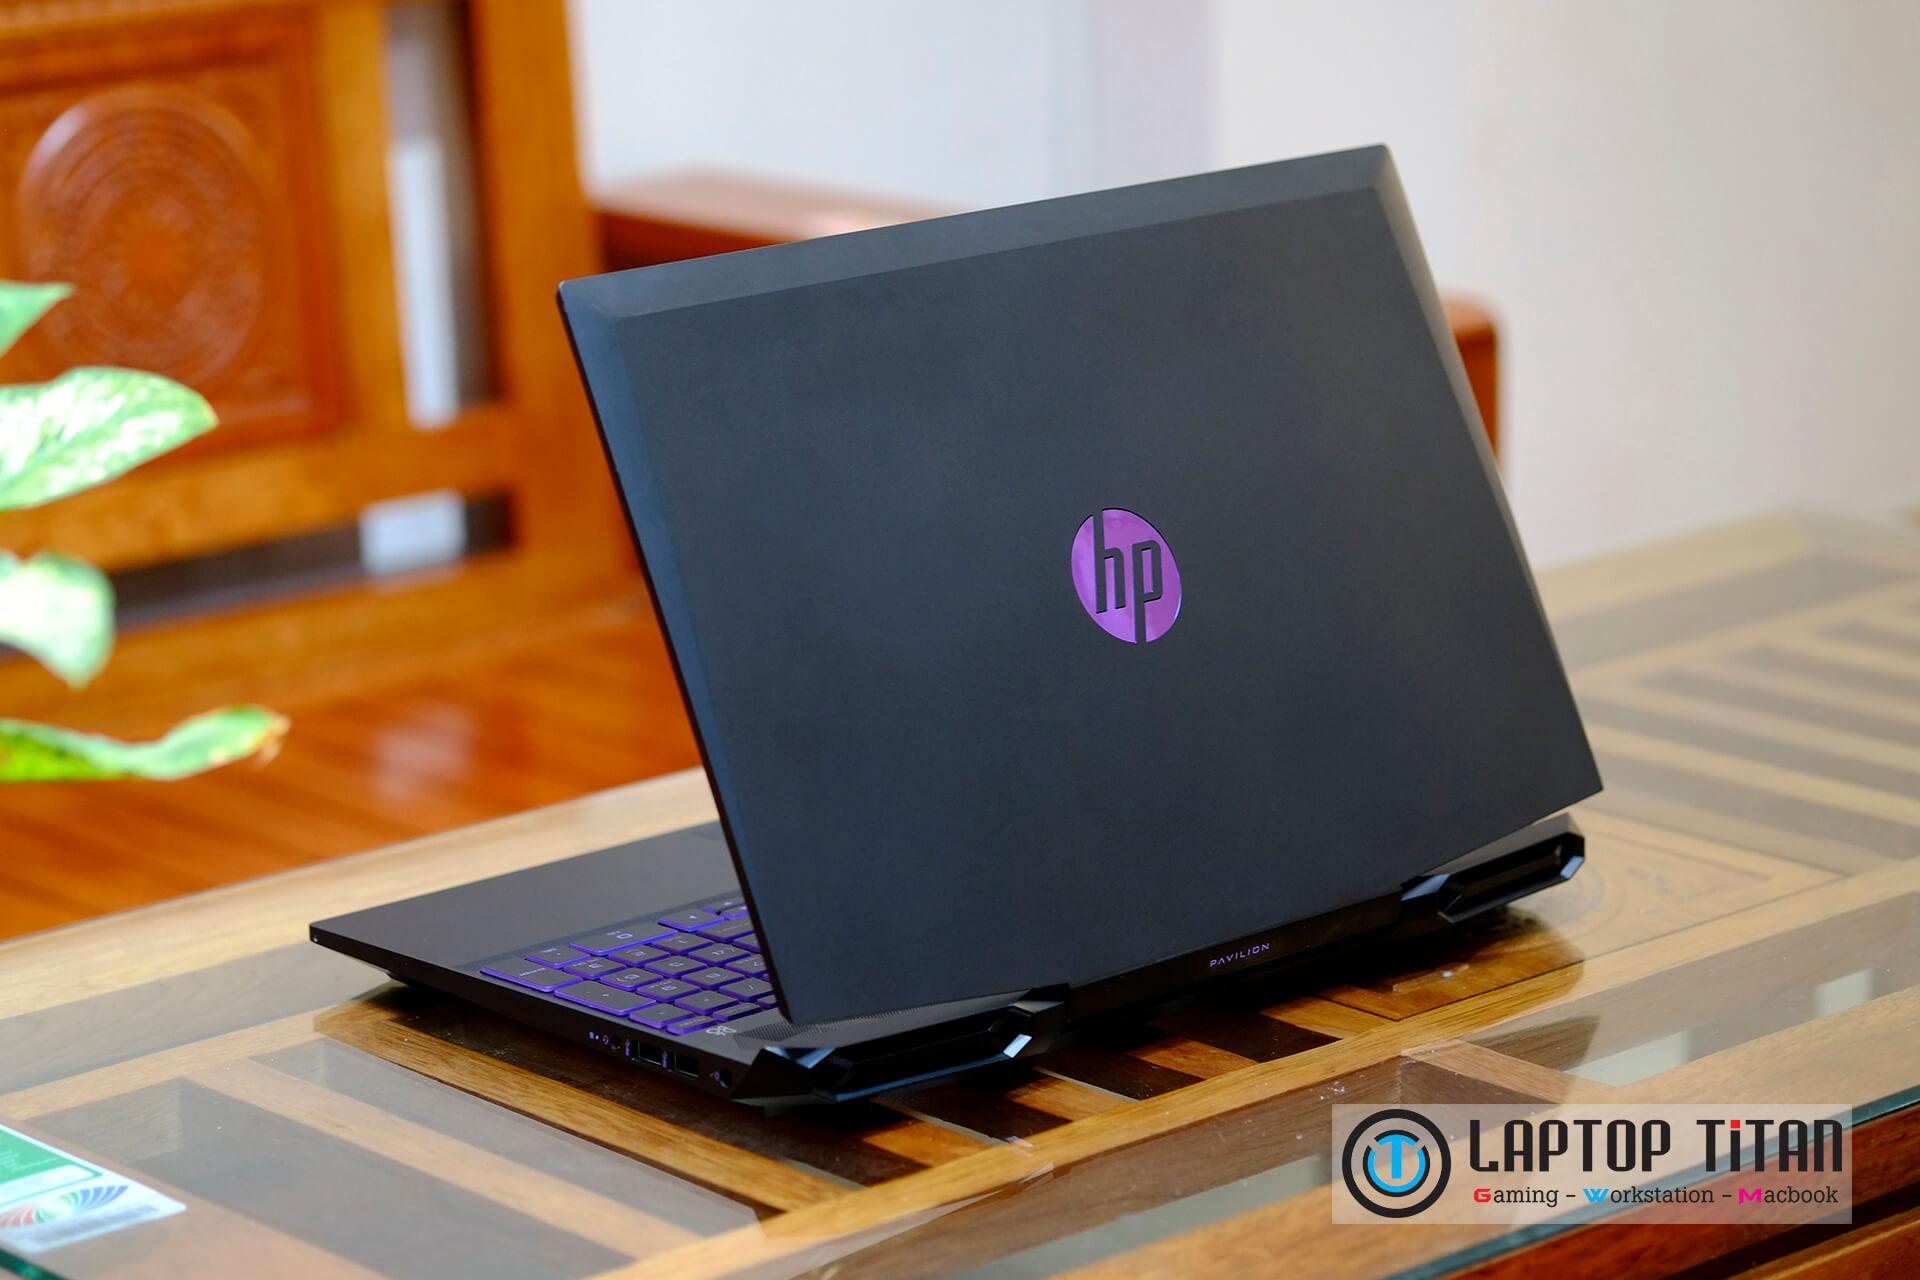 HP Pavilion 15 Gaming Core i7 9750H / 16GB / 256GB + 2TB / GTX 1660Ti / 144Hz FHD